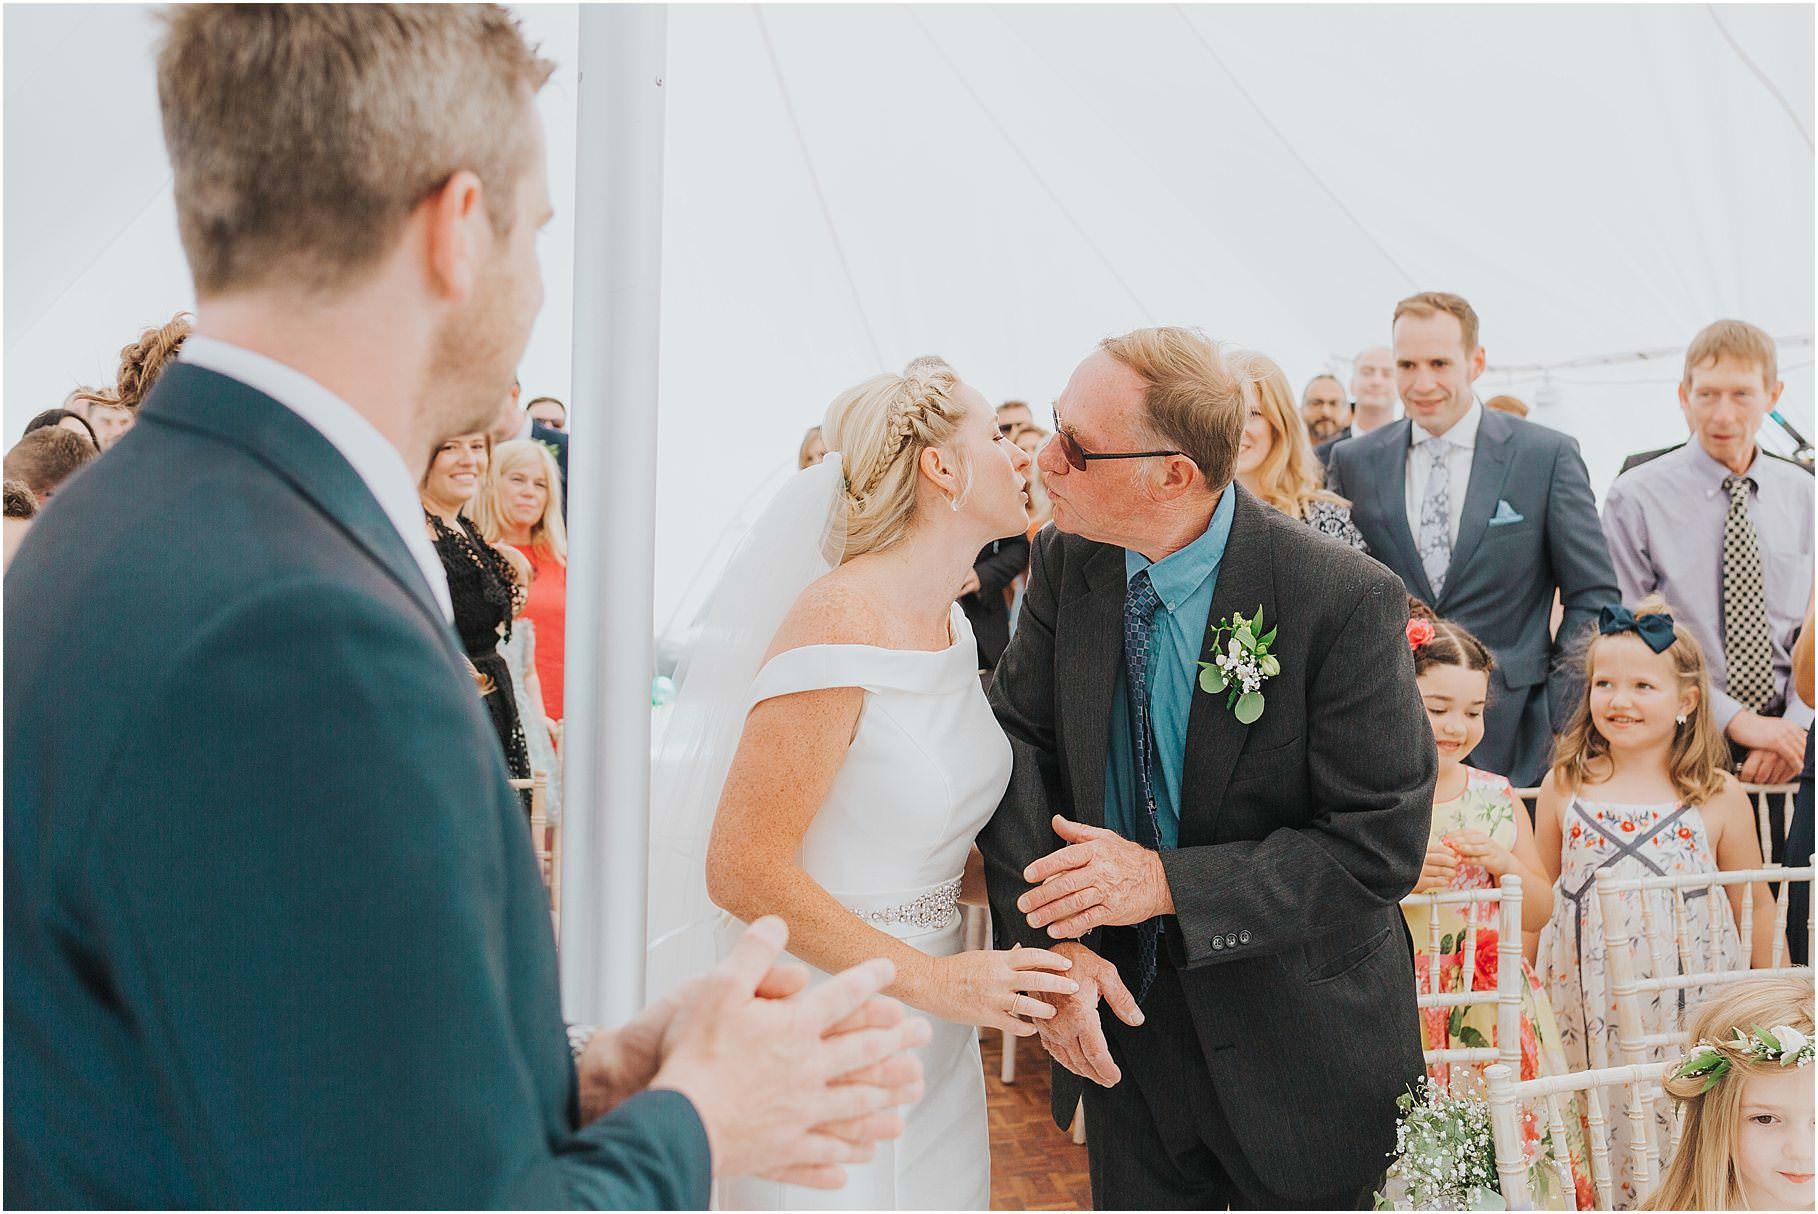 Cambridgeshire Wedding Photographer Black Horse Elton Wedding 1033 - Mr and Mrs Mac // CAMBRIDGESHIRE WEDDING